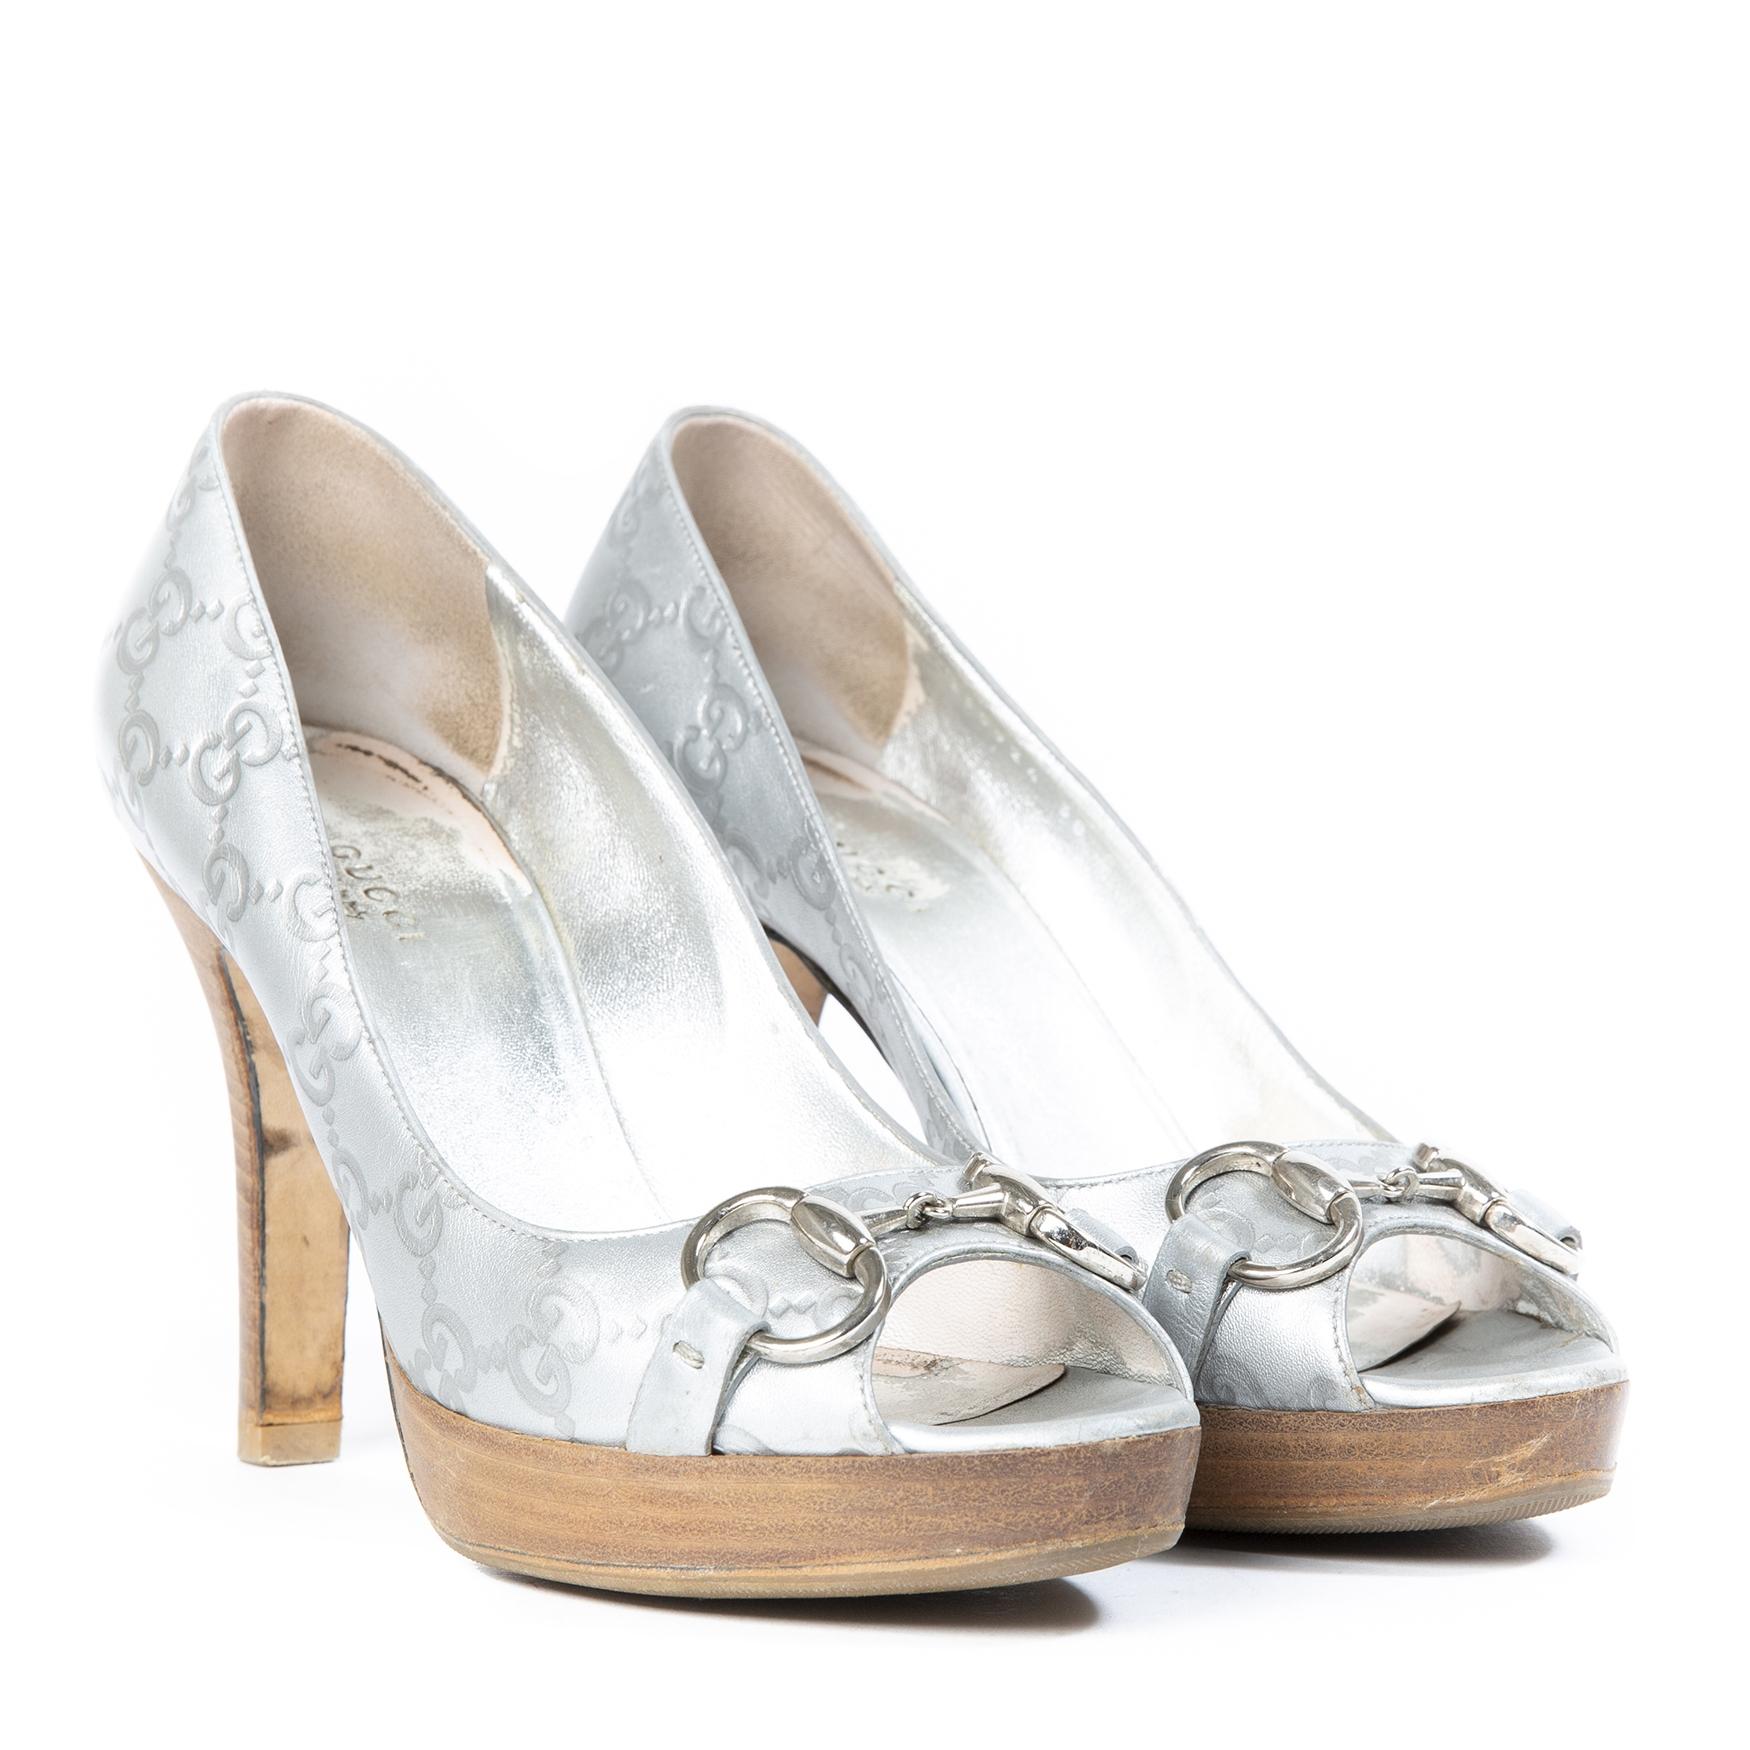 Gucci Silver Monogram Peep Toe Heels